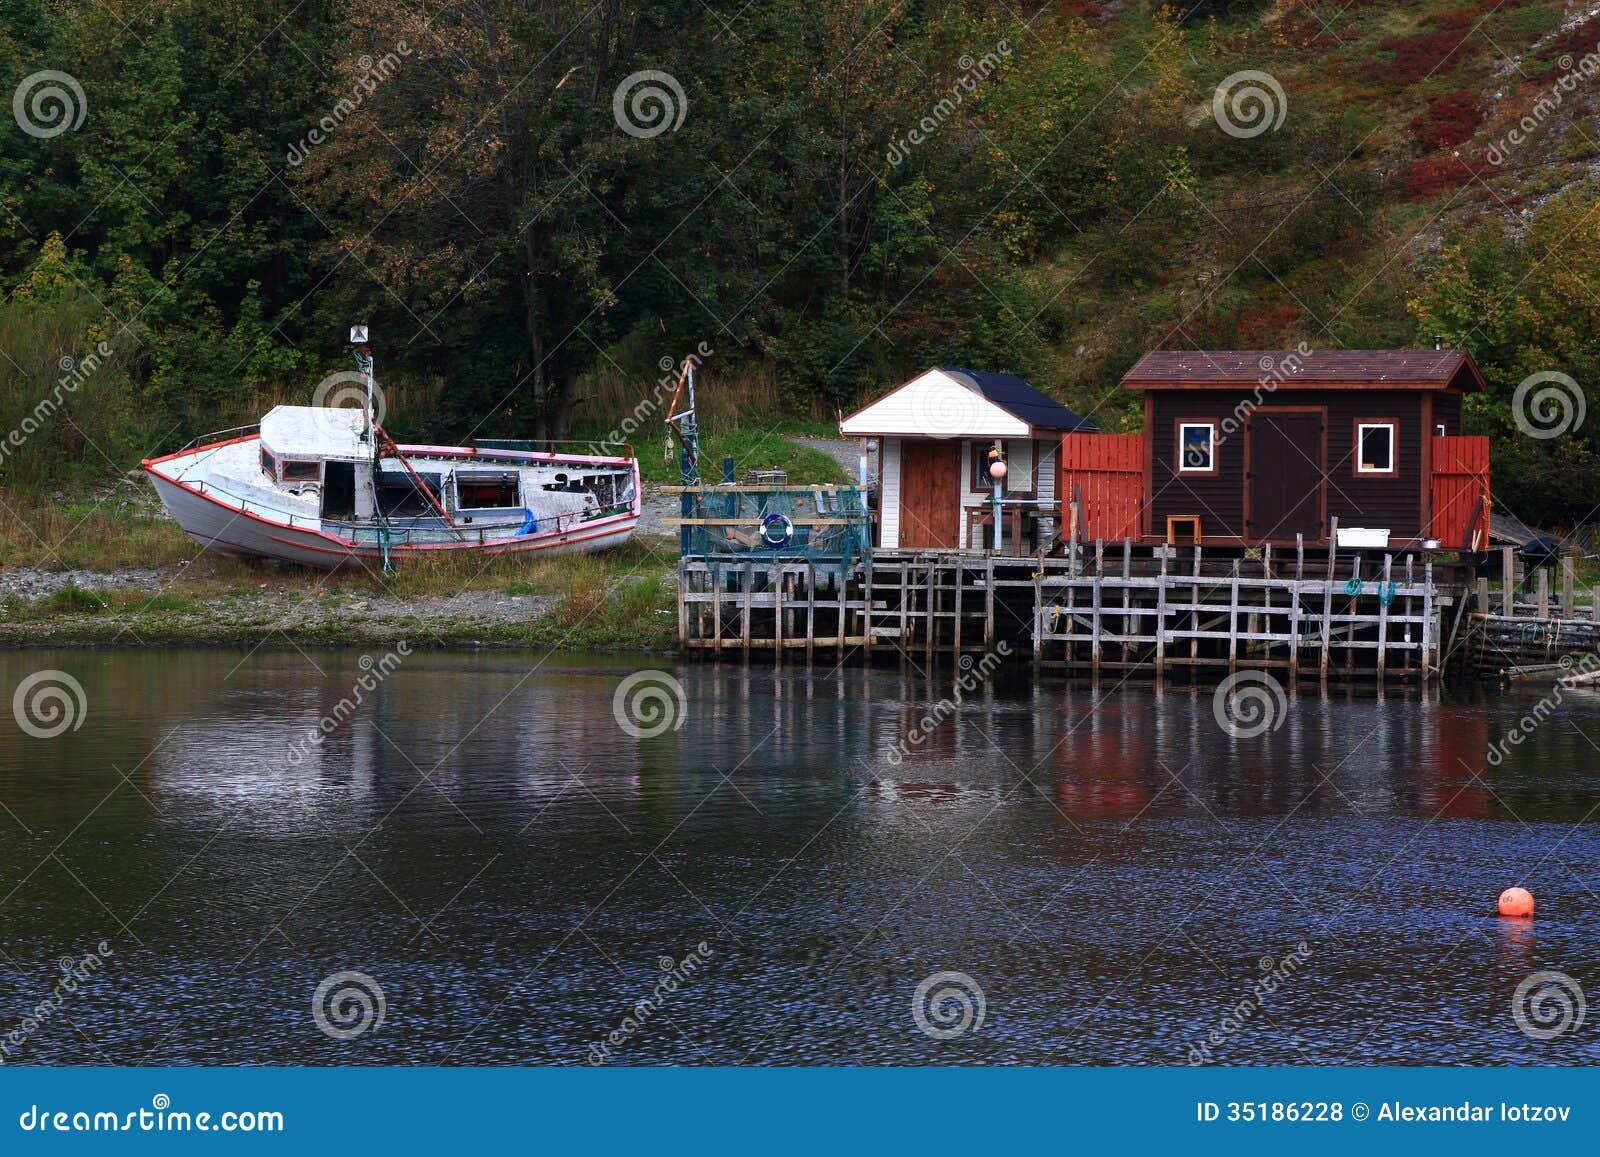 Winterized fishing dock and cabins in quidi vidi harbor for Cabins in newfoundland